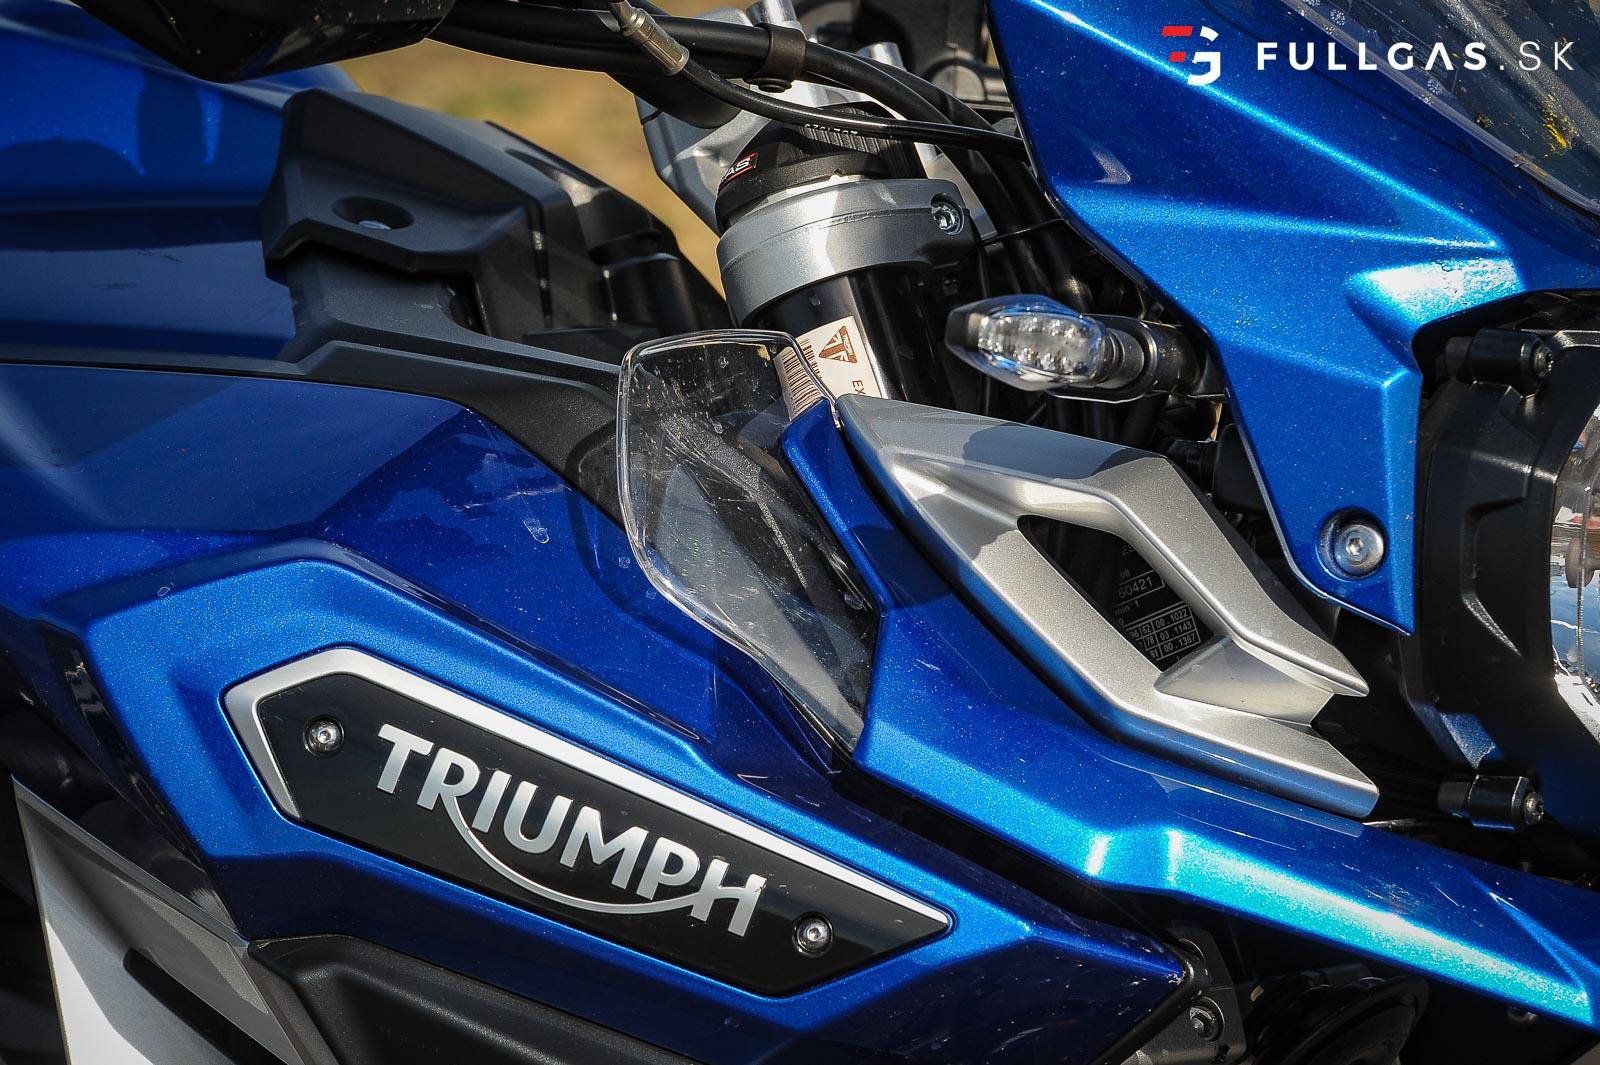 Triumph_Tiger_1200XC_fullgas.sk_0422